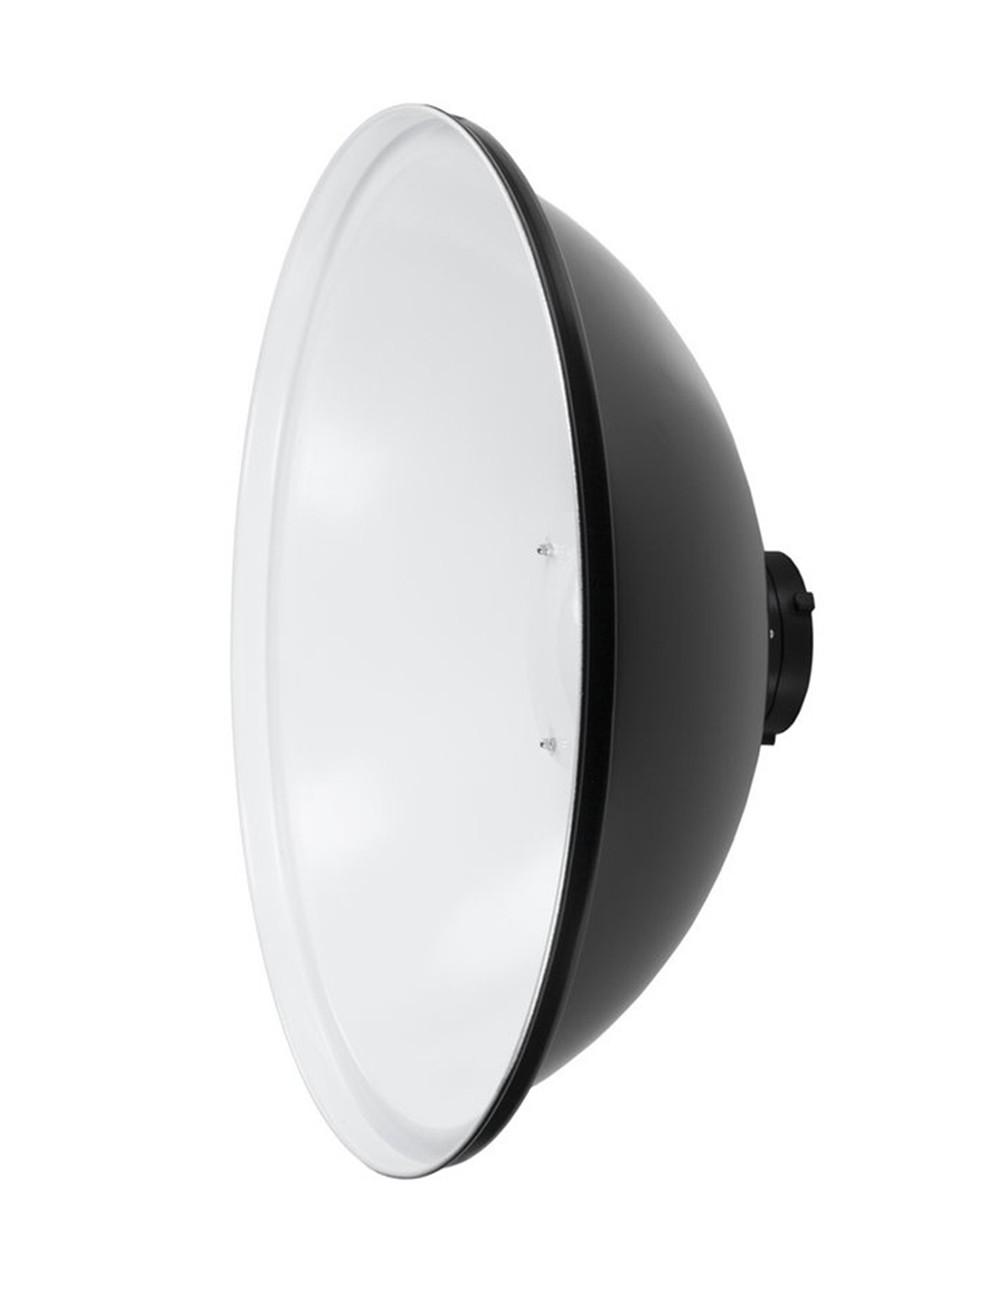 QUADRALITE Parabola Beauty Dish 42cm Bianca